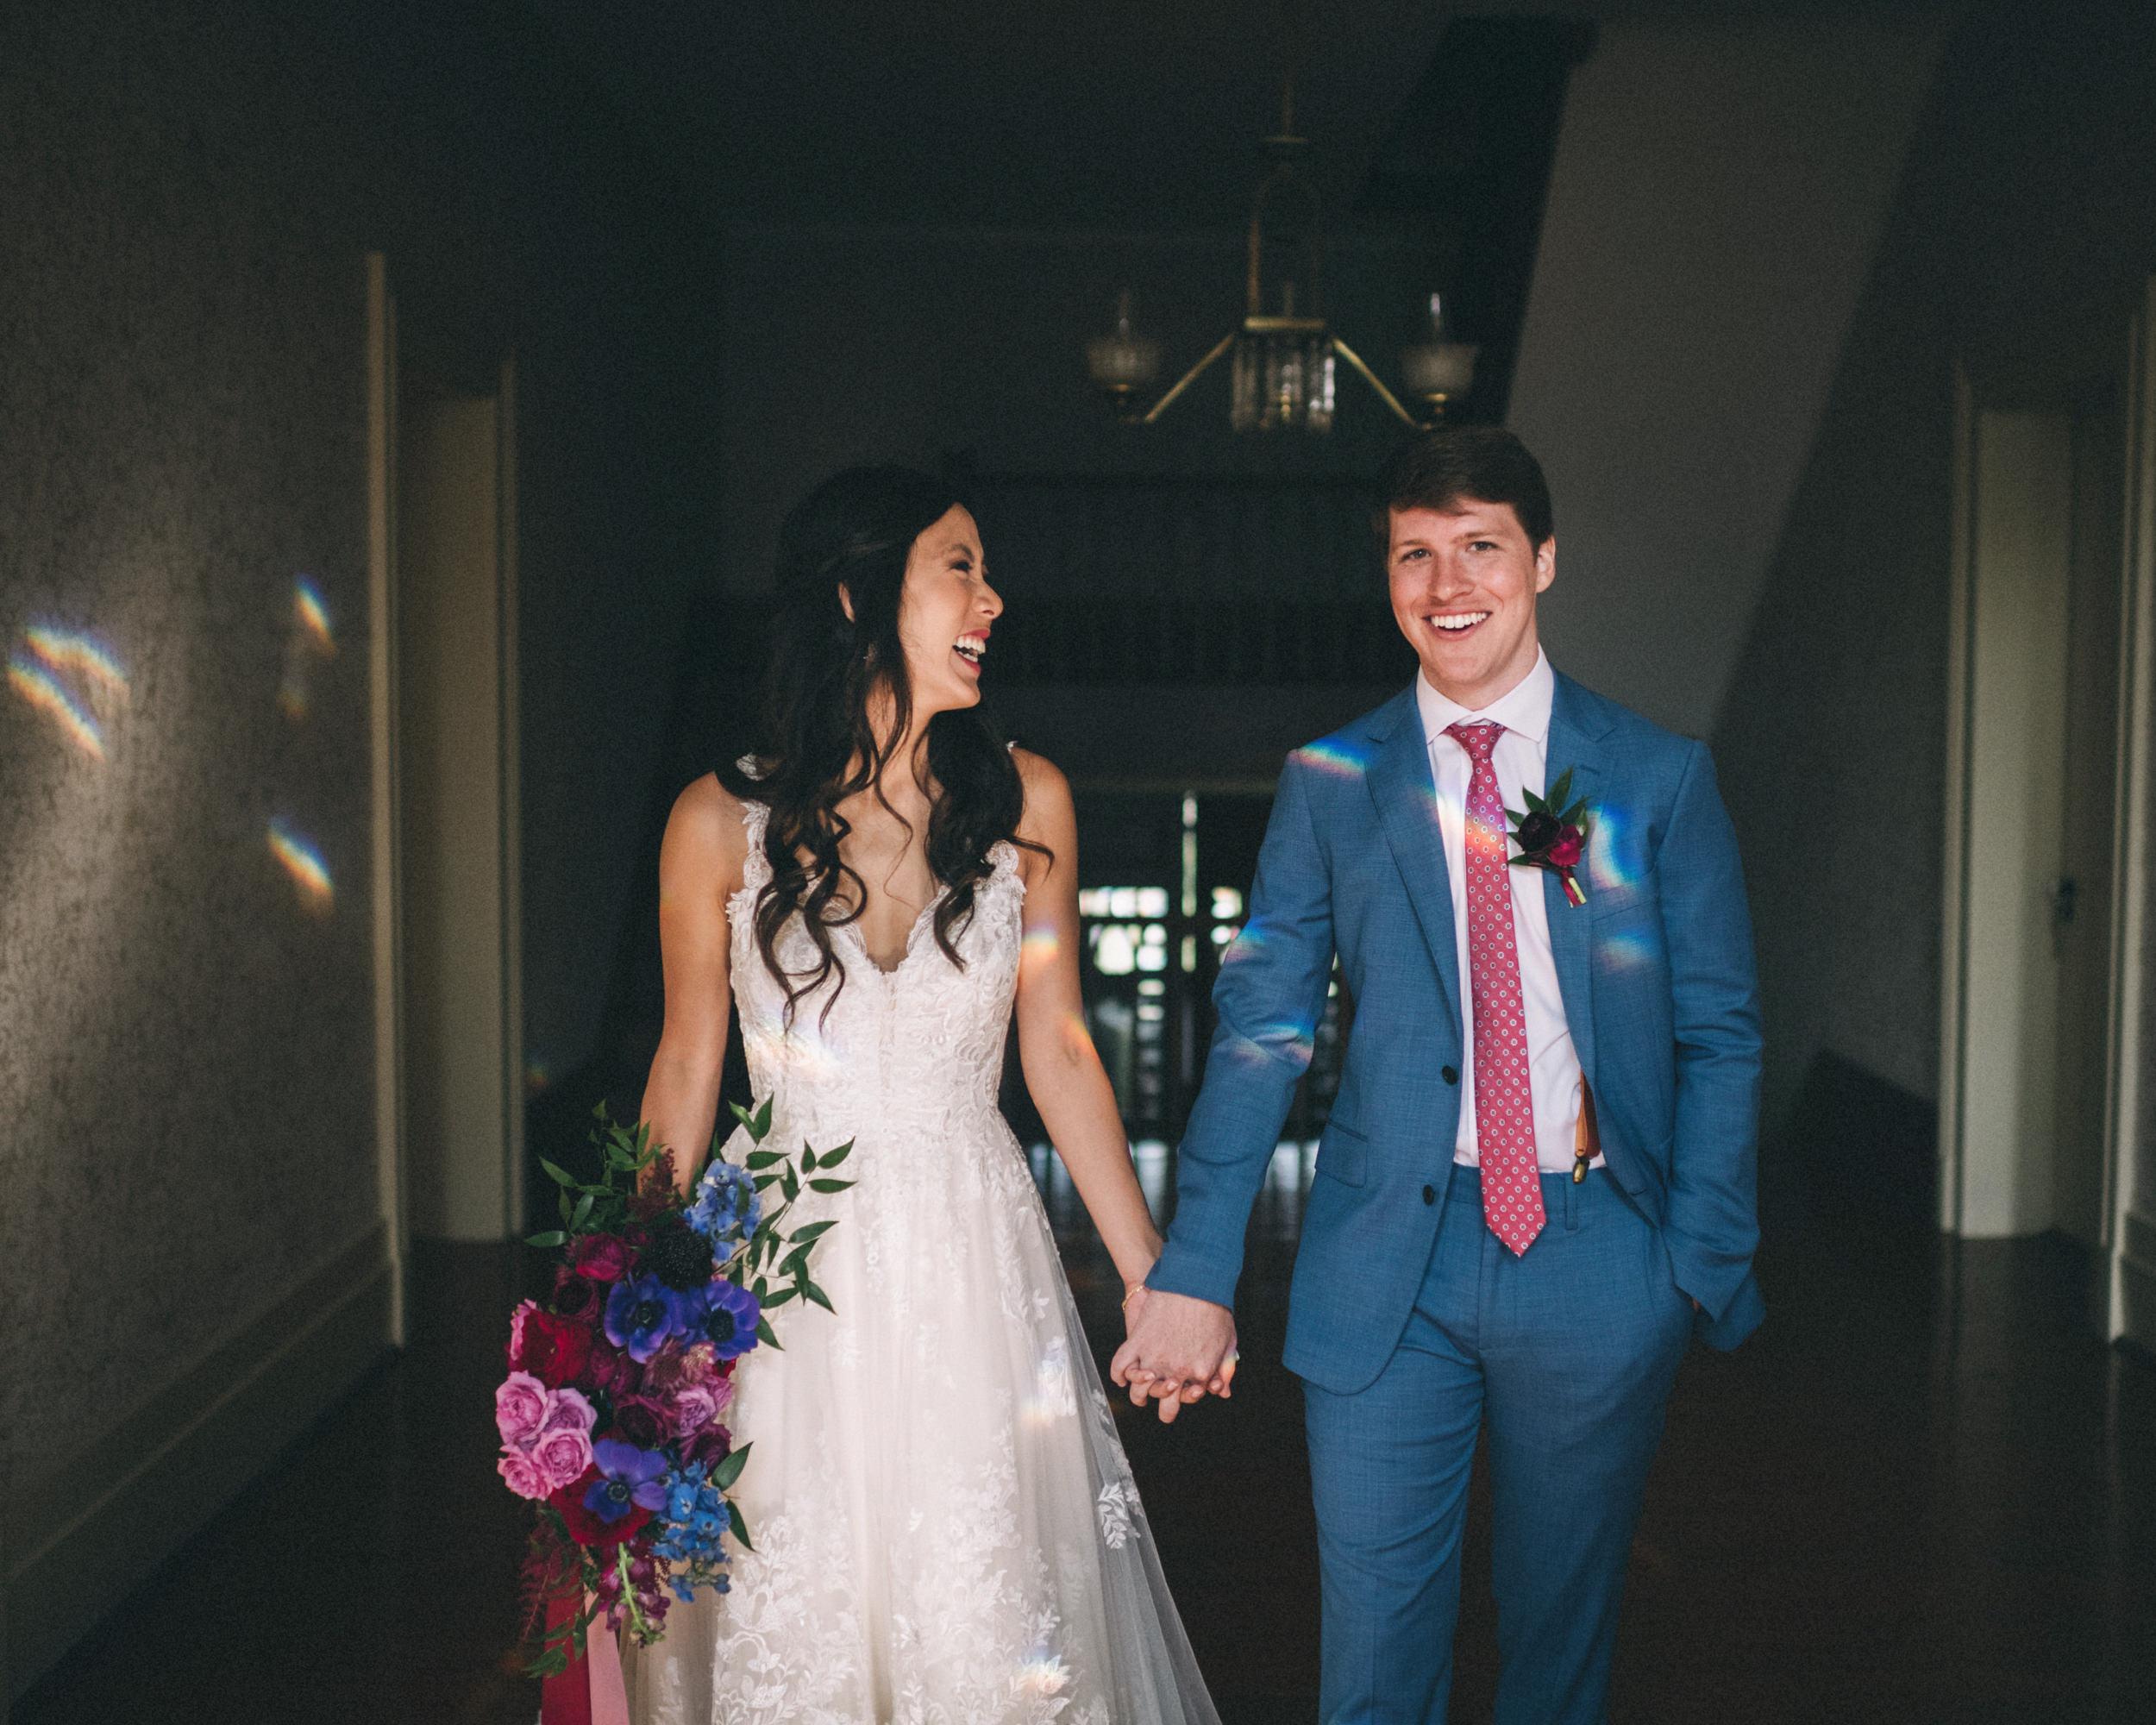 Louisville-Kentucky-Wedding-and-Elopement-Photographer-Sarah-Katherine-Davis-Photography-Summer-Jewel-Toned-Wedding-Chineese-Tea-Ceremony-Warrenwood-Manor-Danville-419.jpg